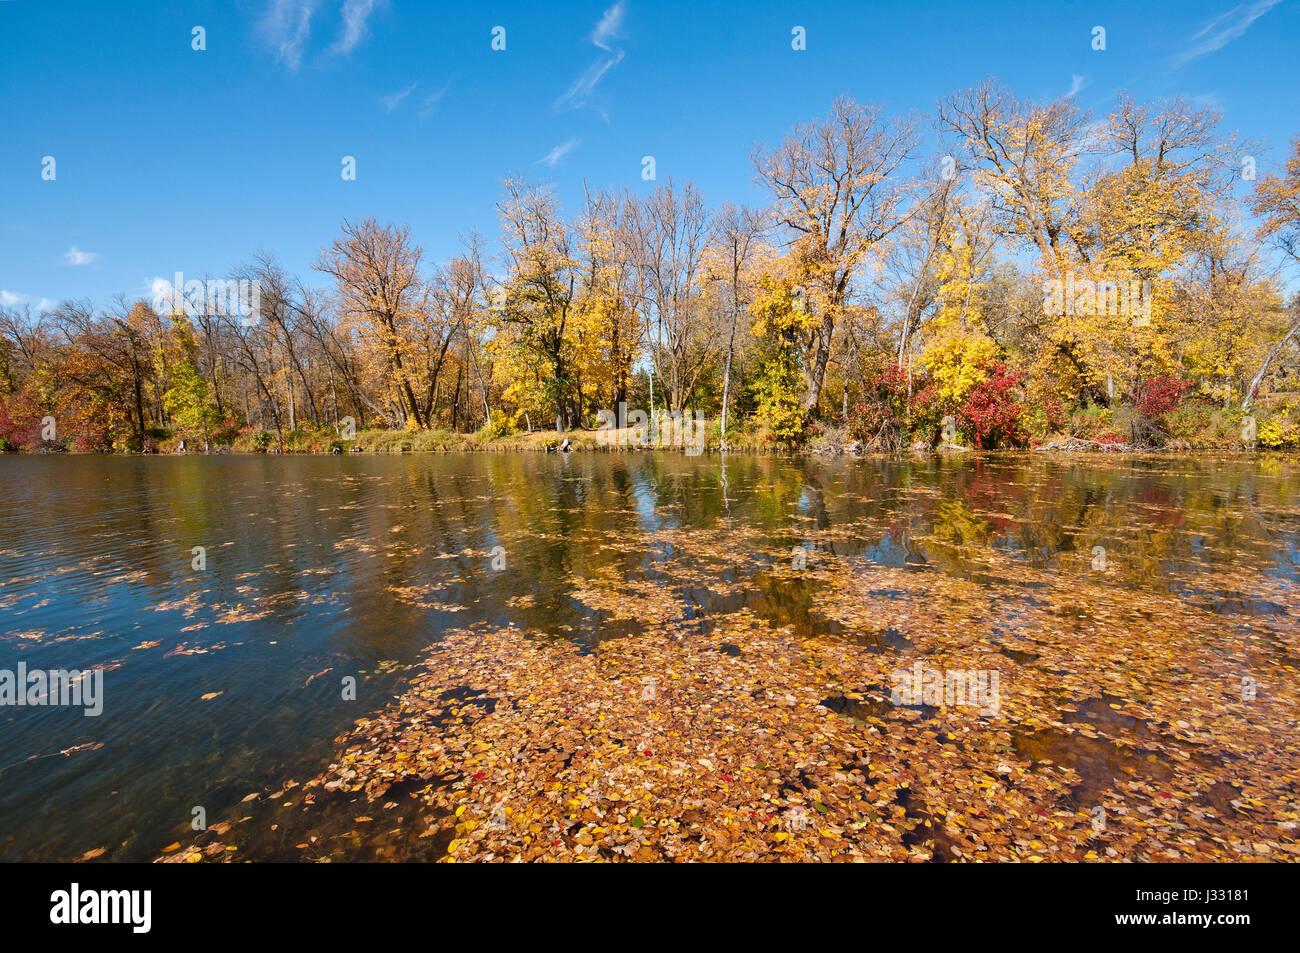 Marshs lake, fall foliage, Spruce Woods Provincial Park, Manitoba, Canada - Stock Image